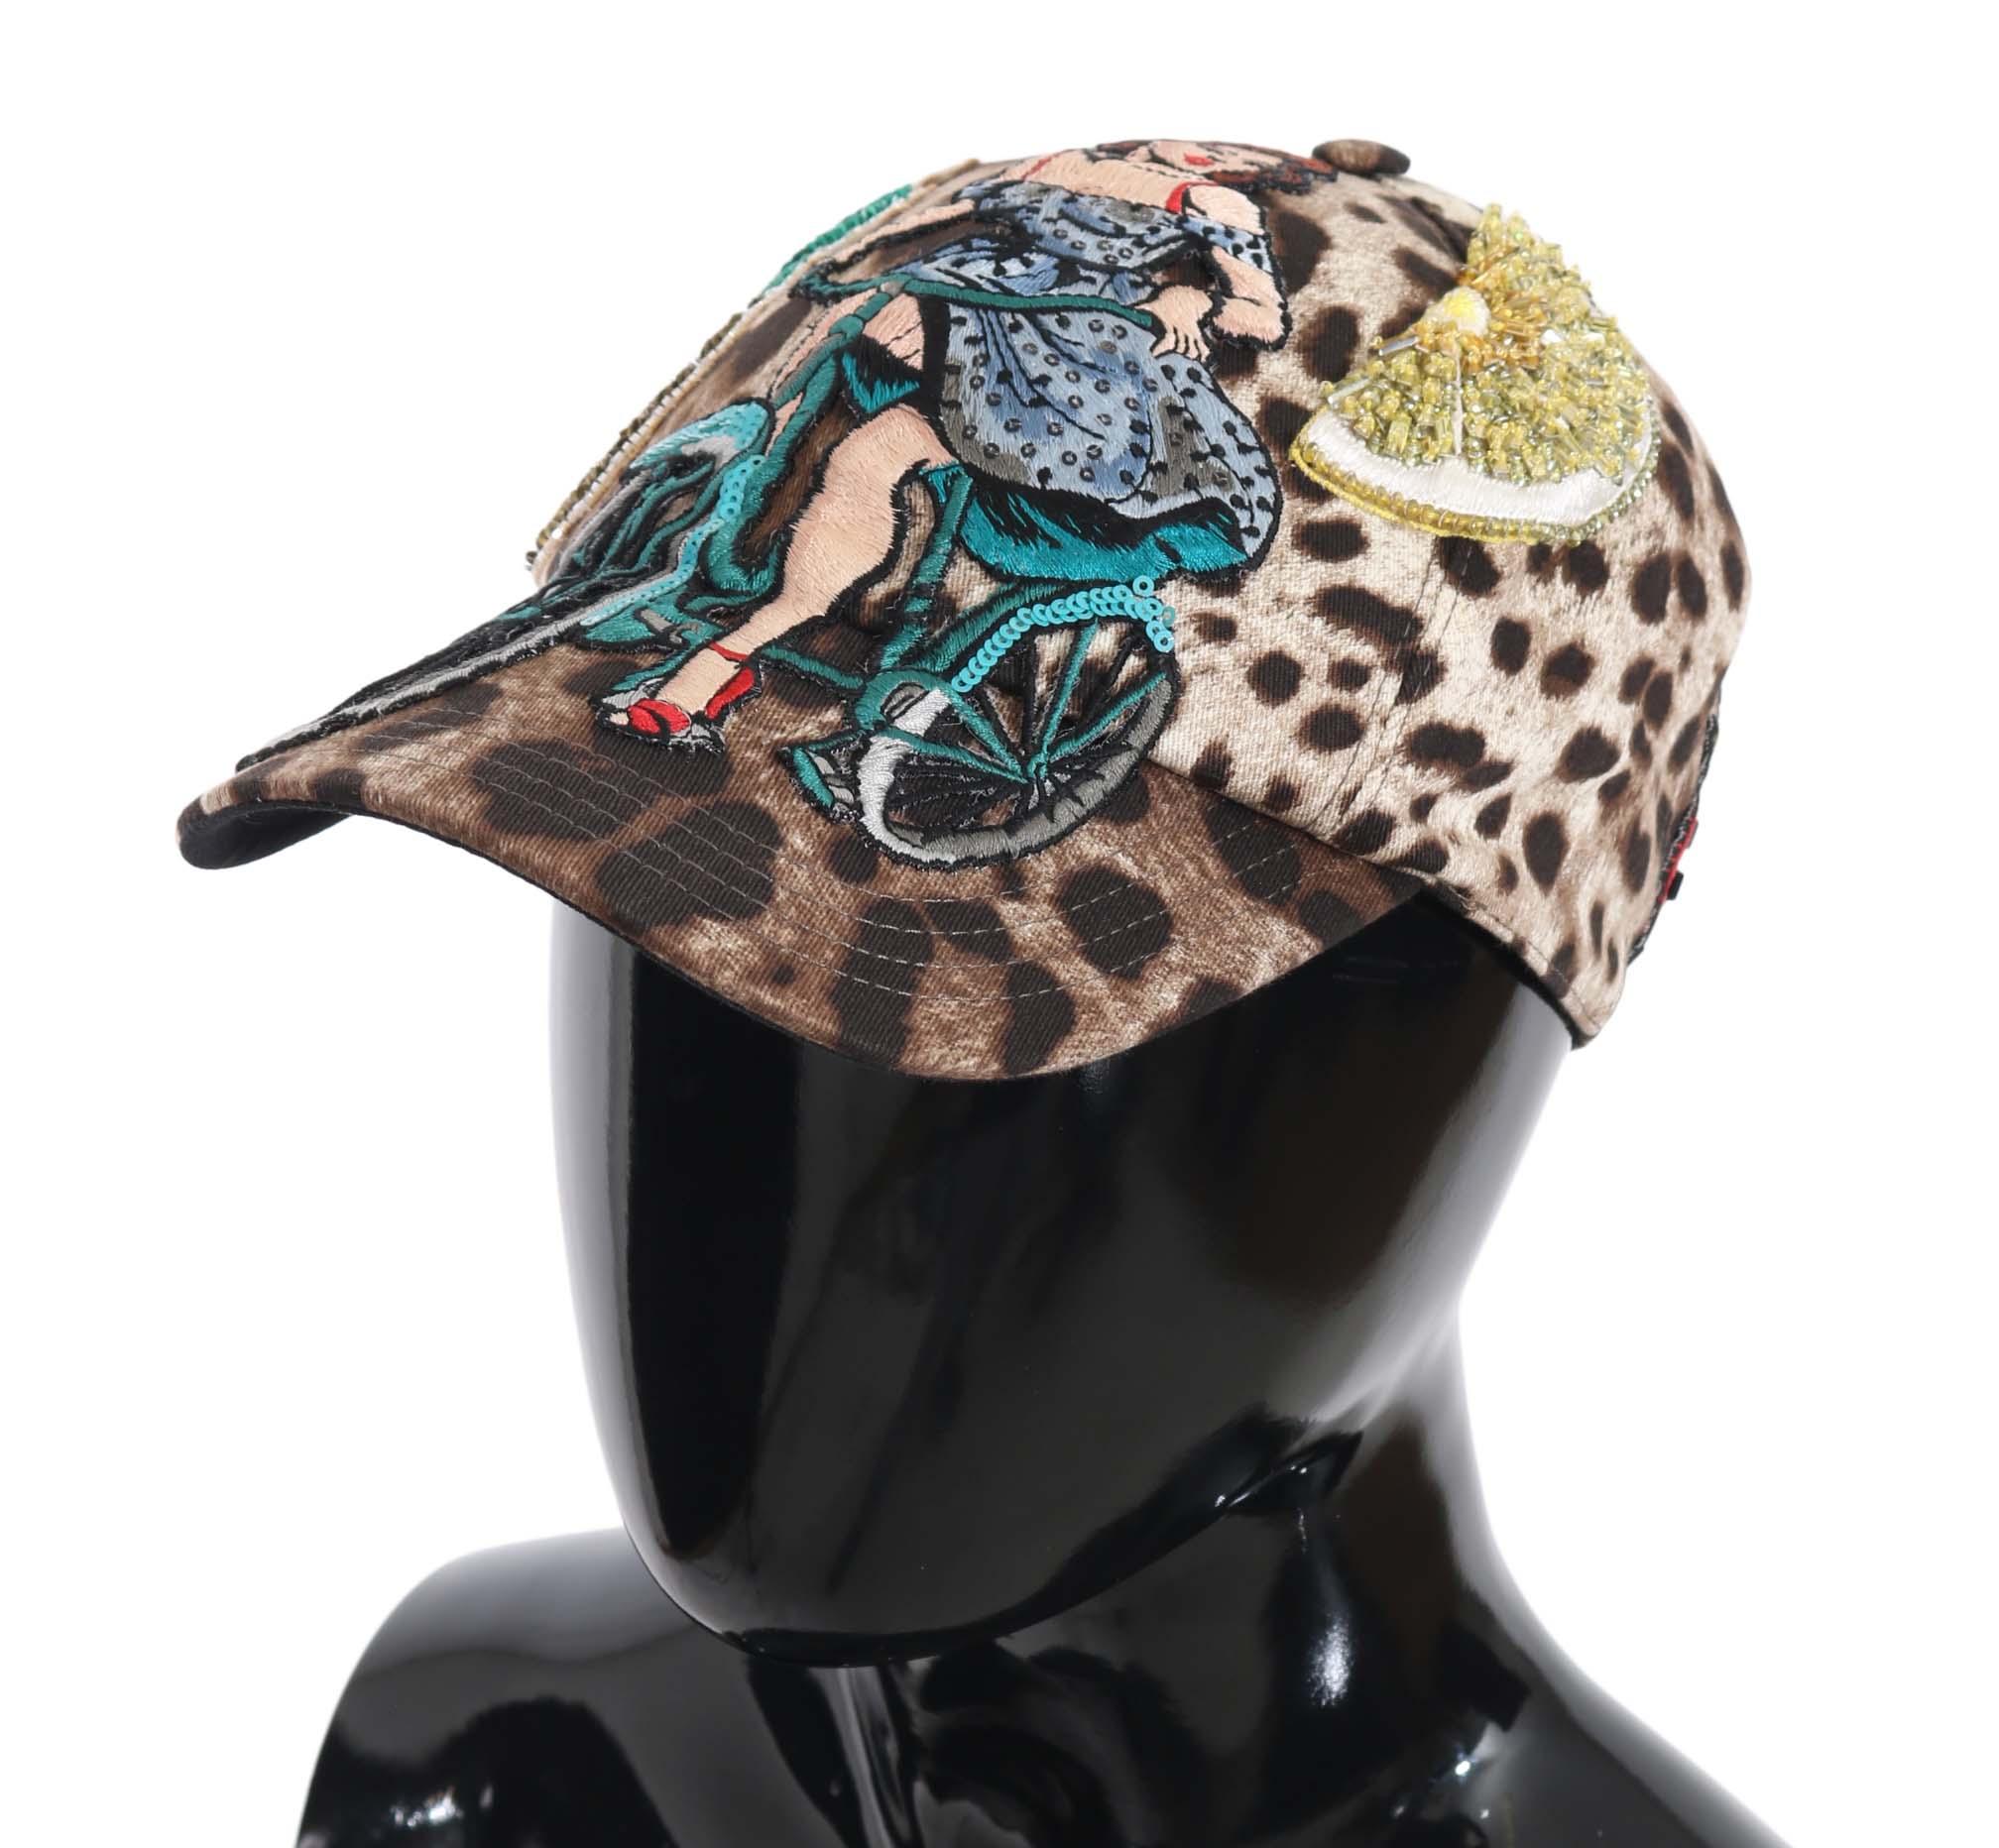 Dolce & Gabbana Women's Leopard Sequin Sicily Applique Baseball Hat Brown HAT70141 - 56 cm XS